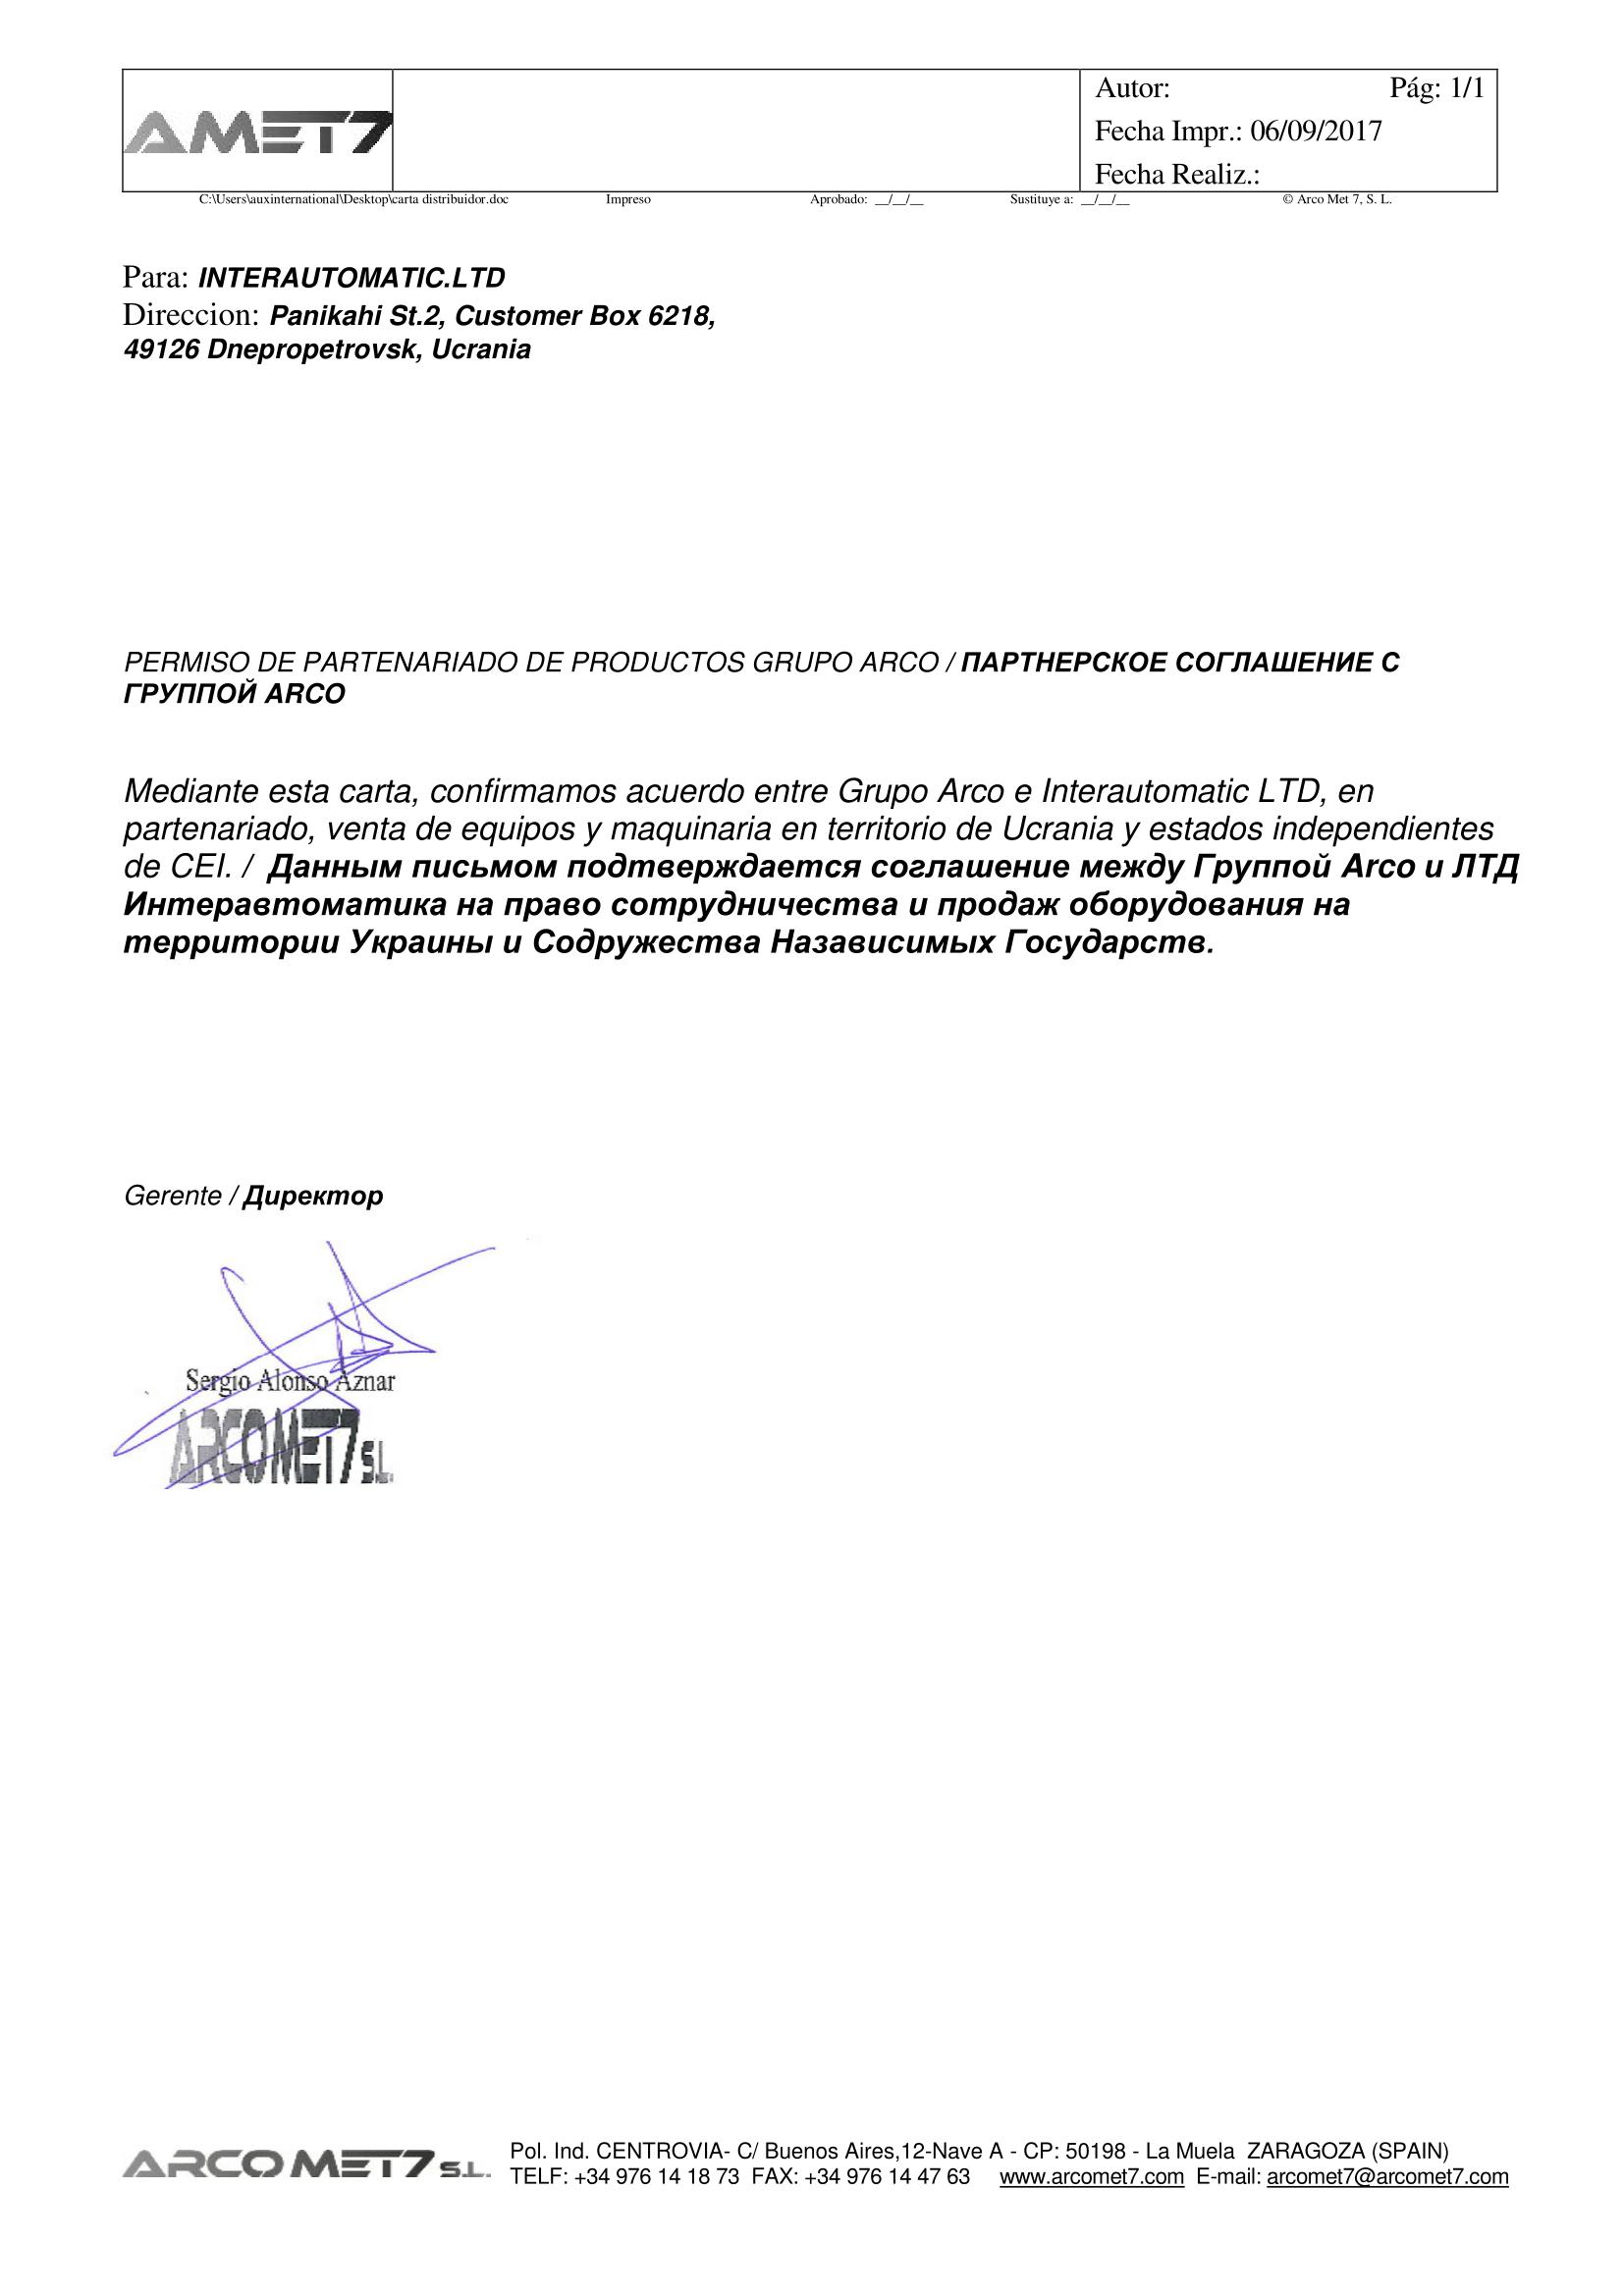 Сертификат Aromet7